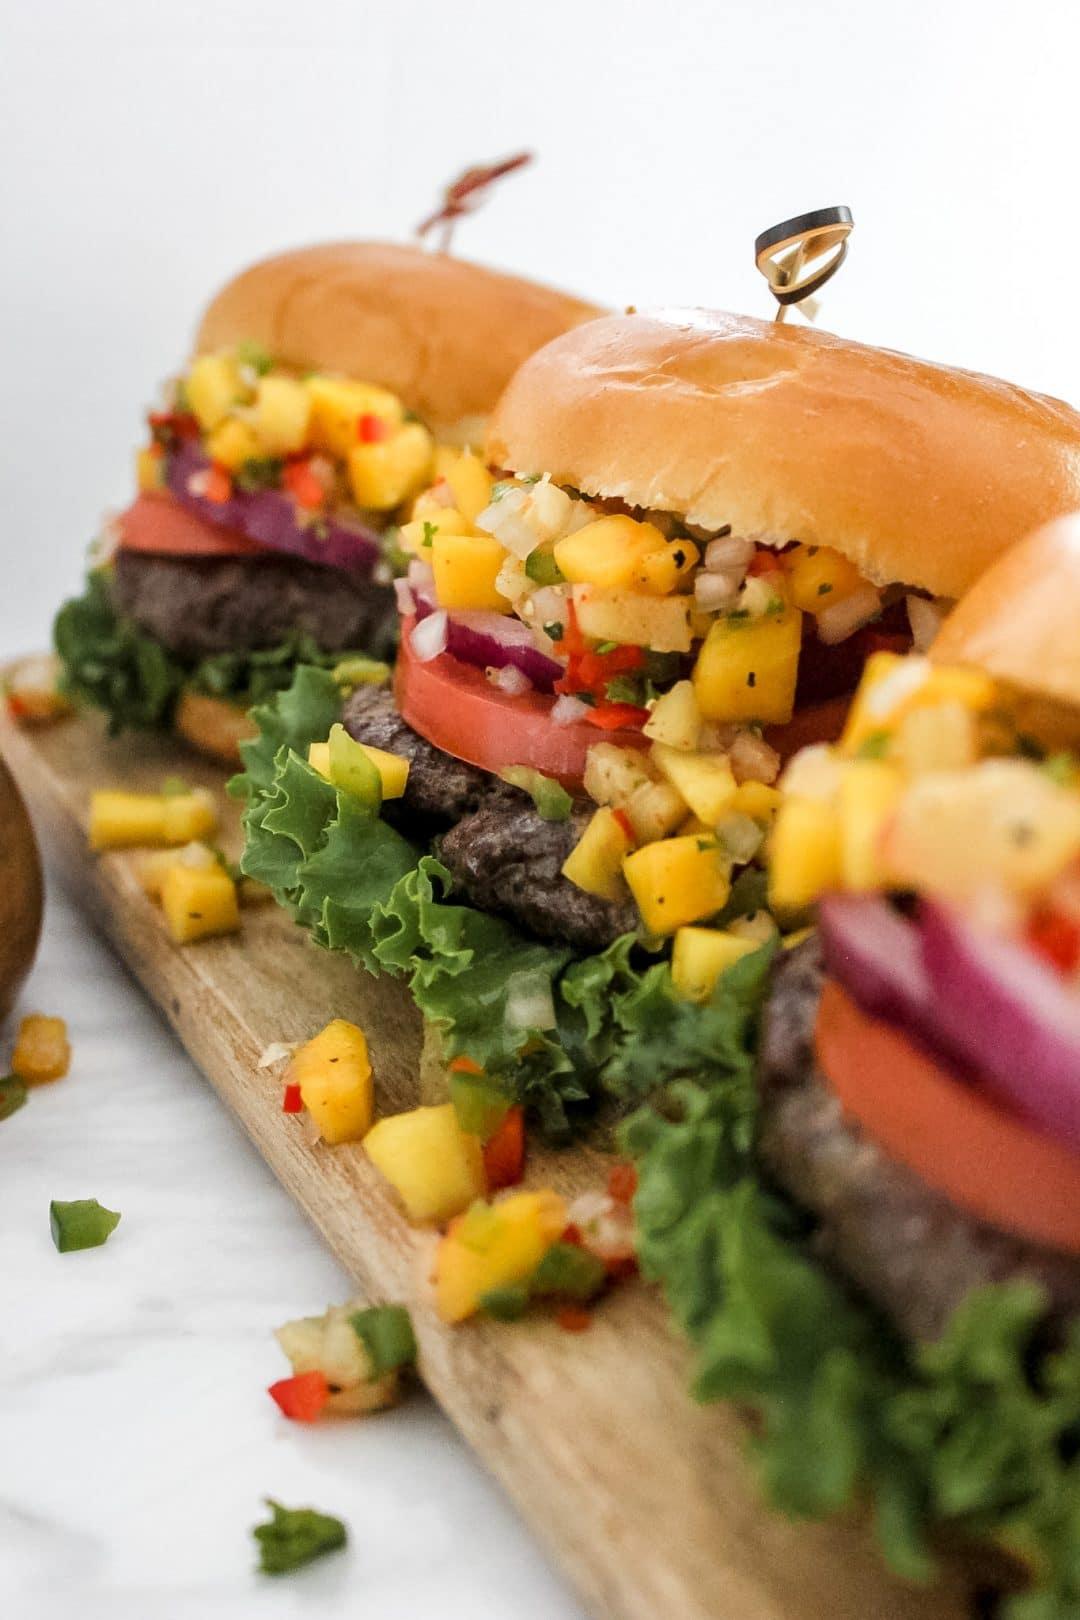 3 Jerk Burgers with Pineapple Mango Salsa on Wooden Board